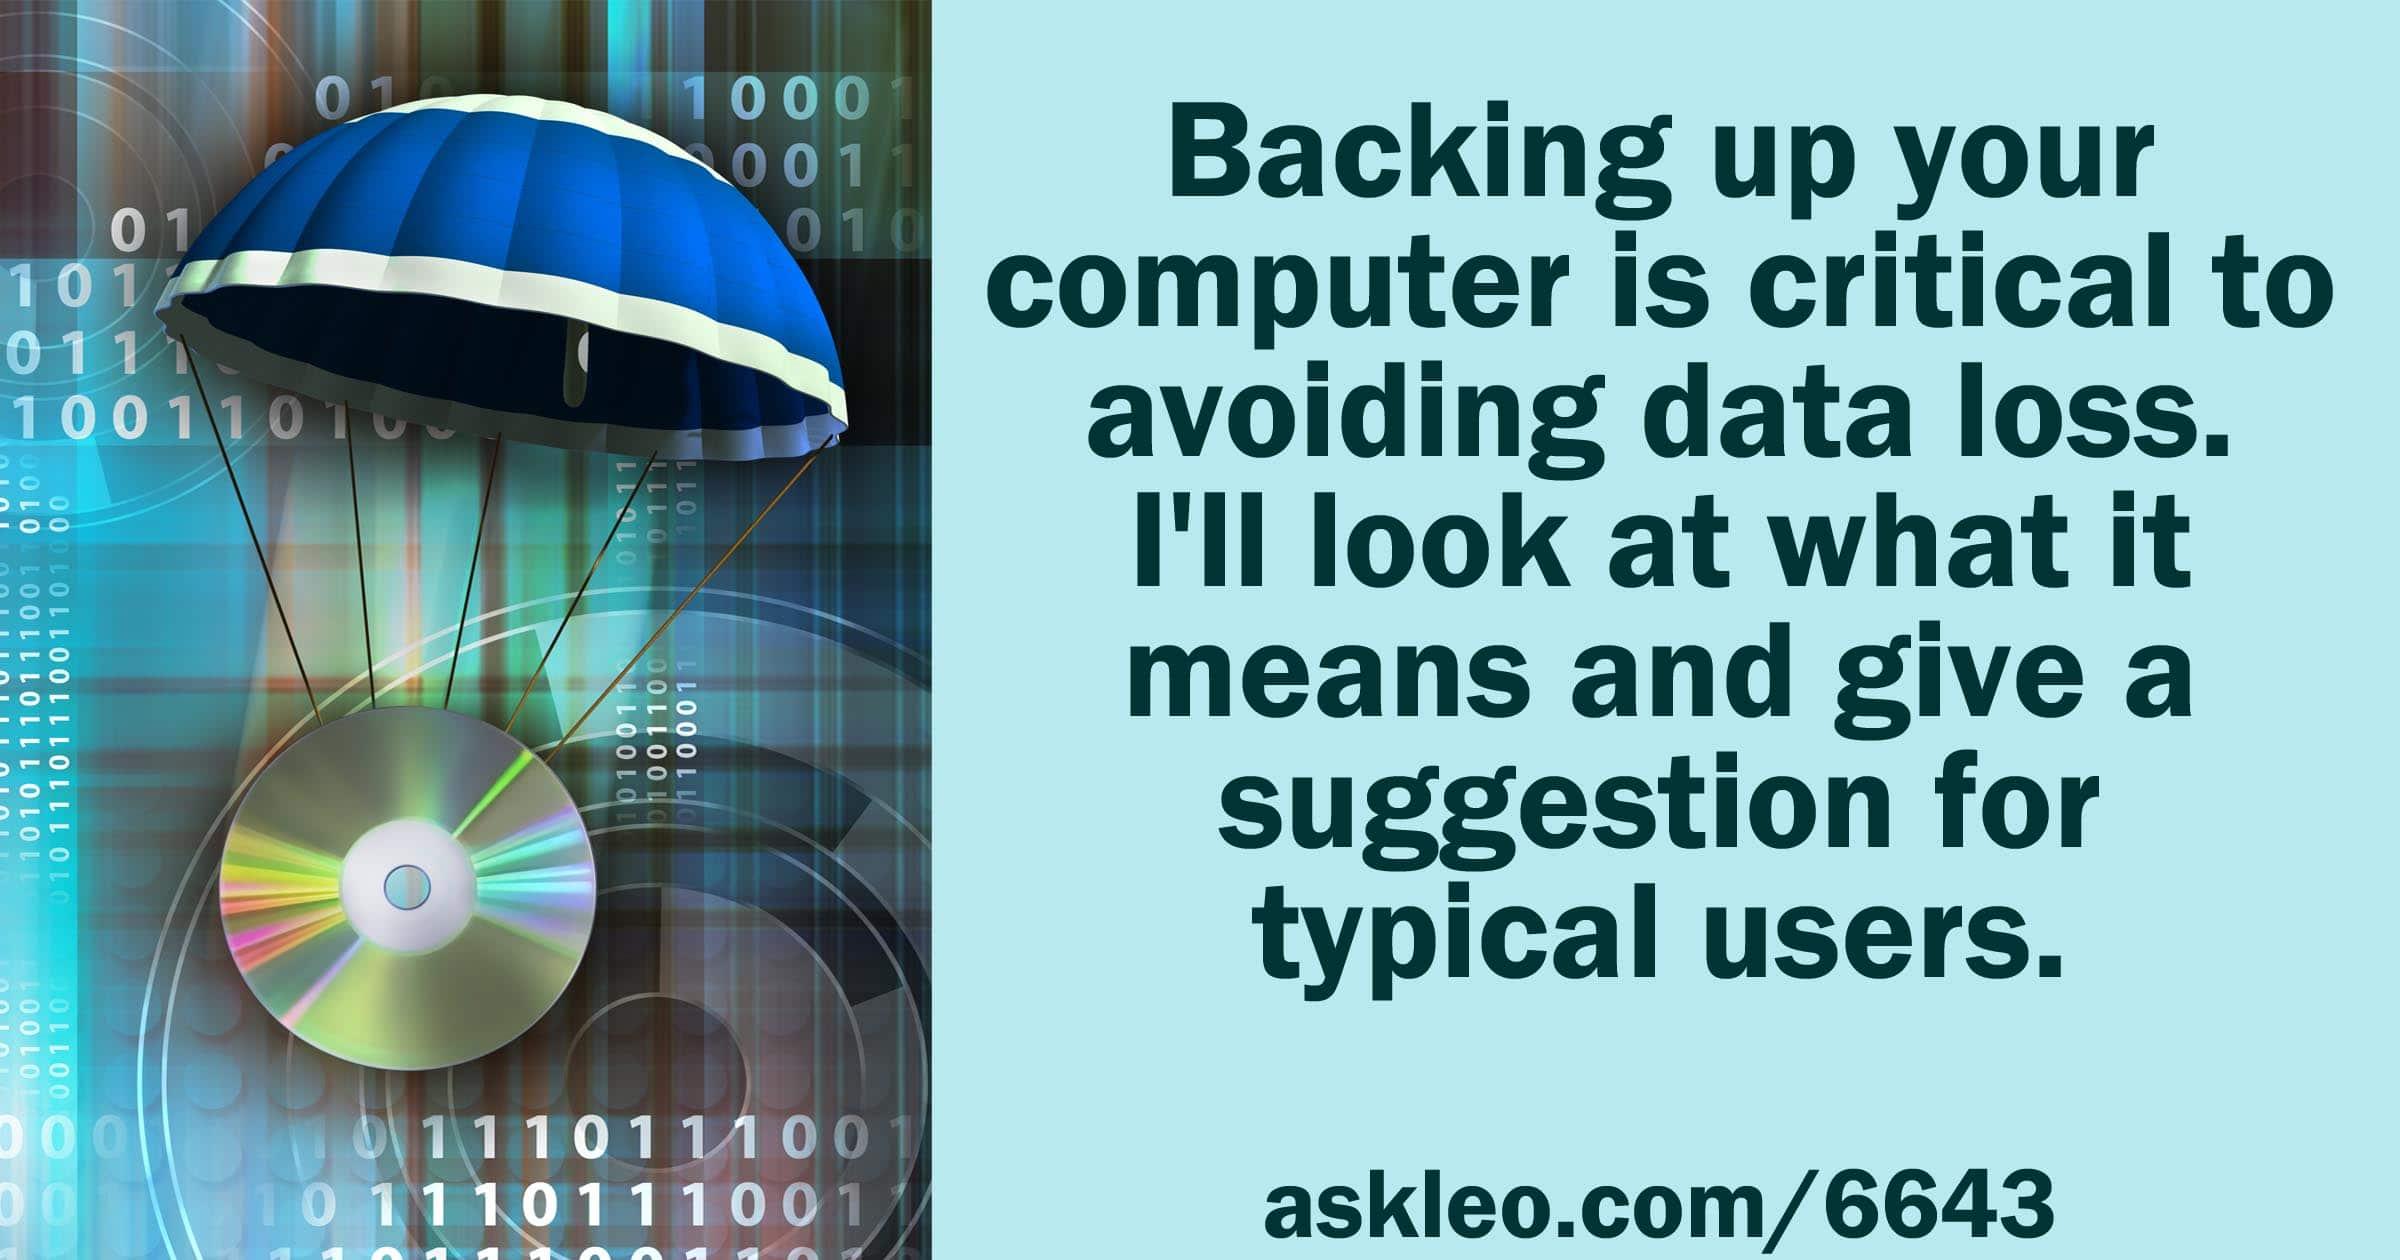 327cc7550b6 How Do I Back Up My Computer? - Ask Leo!